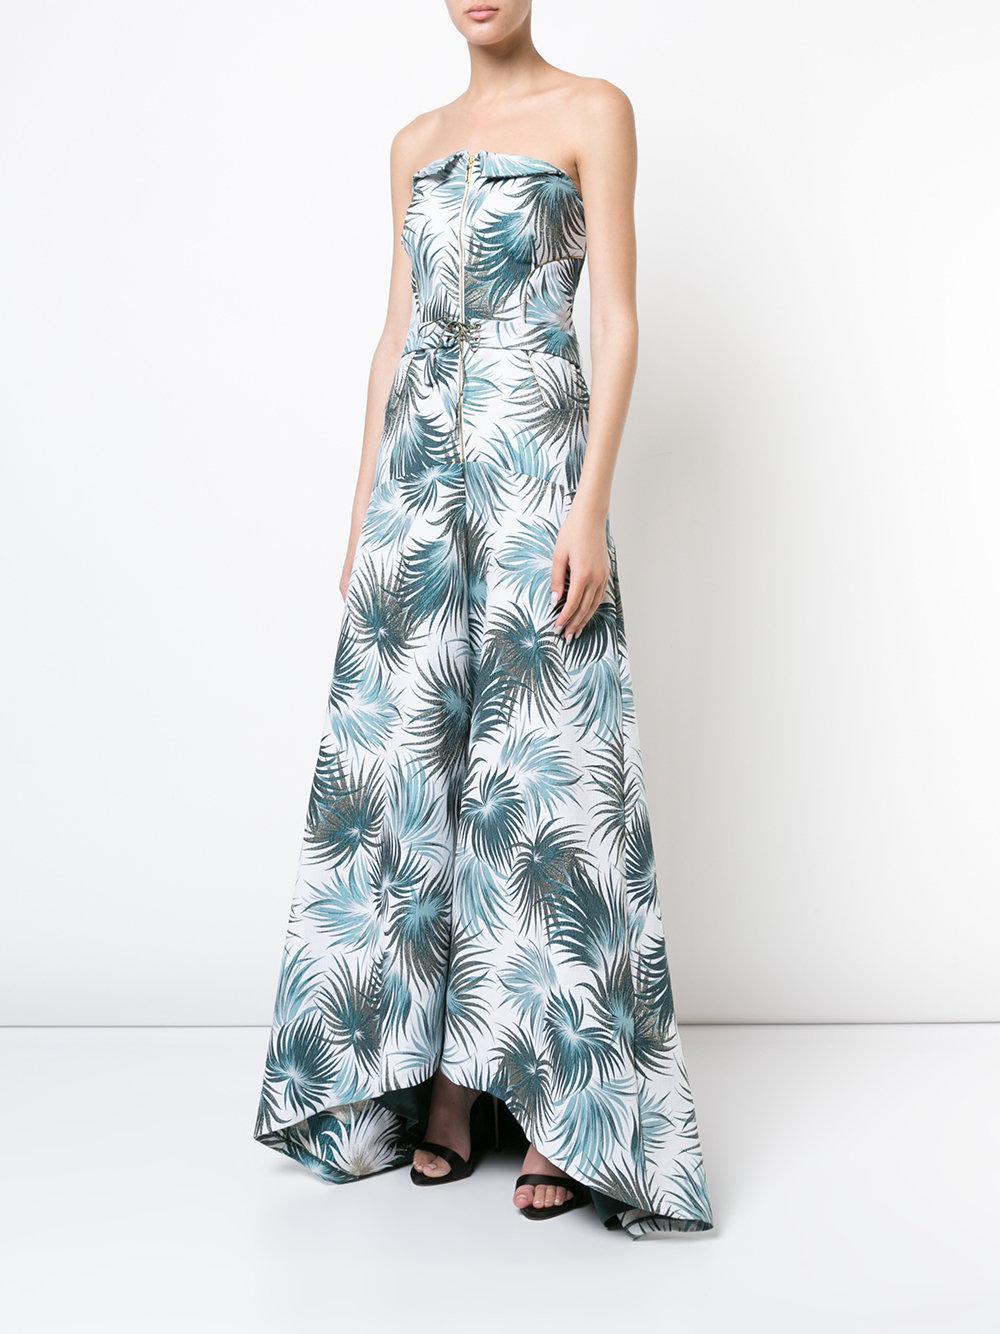 foliage print strapless gown - White Nicole Miller qI3nrU4oik